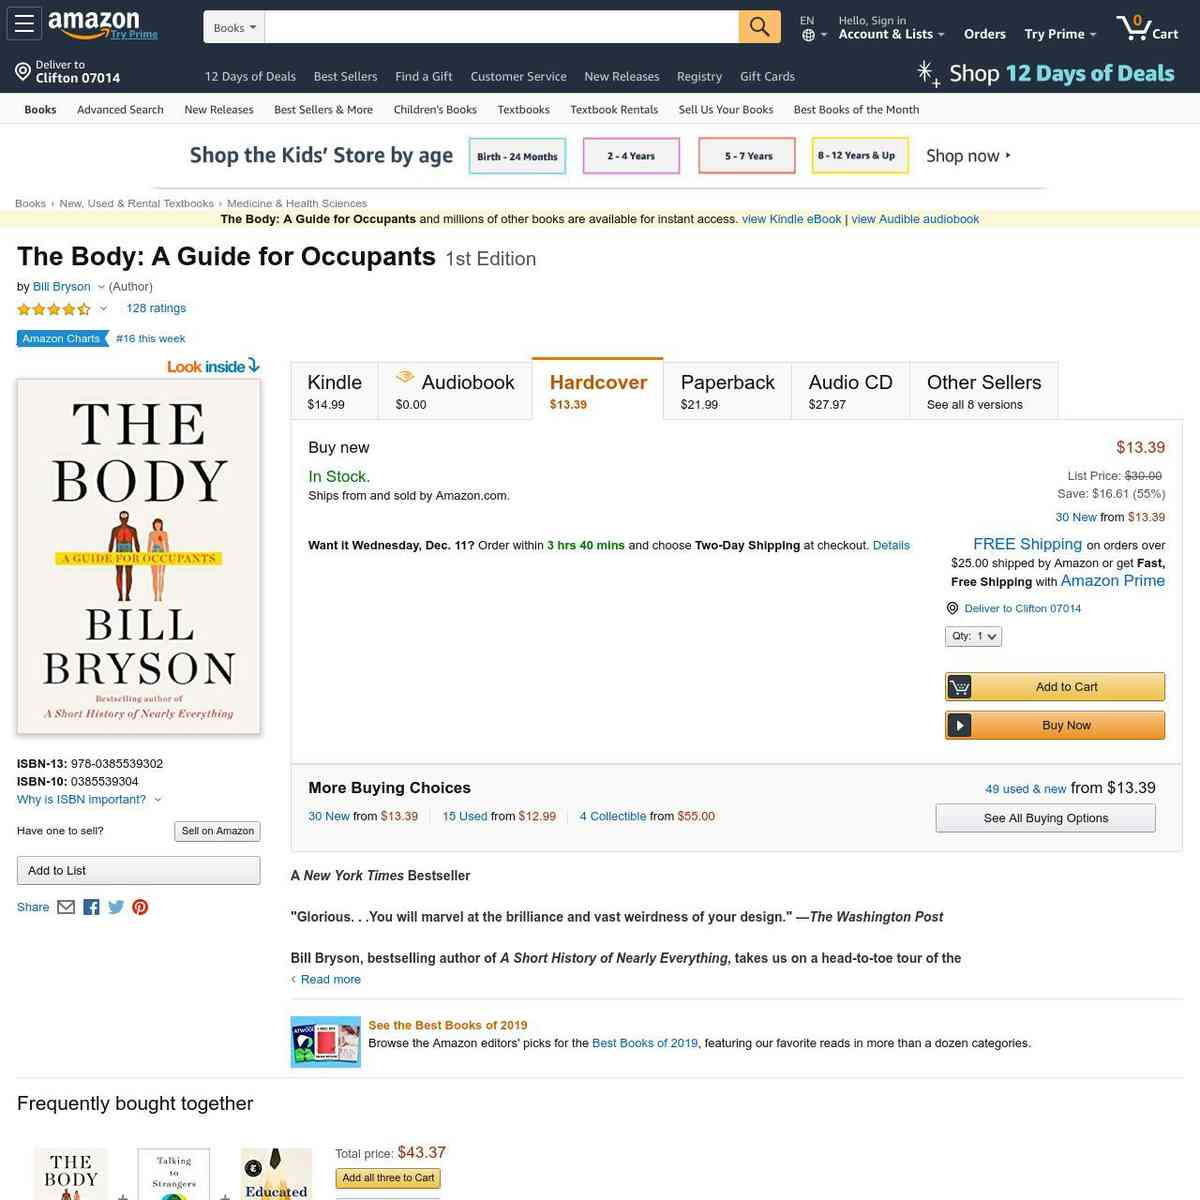 The Body: A Guide for Occupants: 9780385539302: Medicine & Health Science Books @ Amazon.com